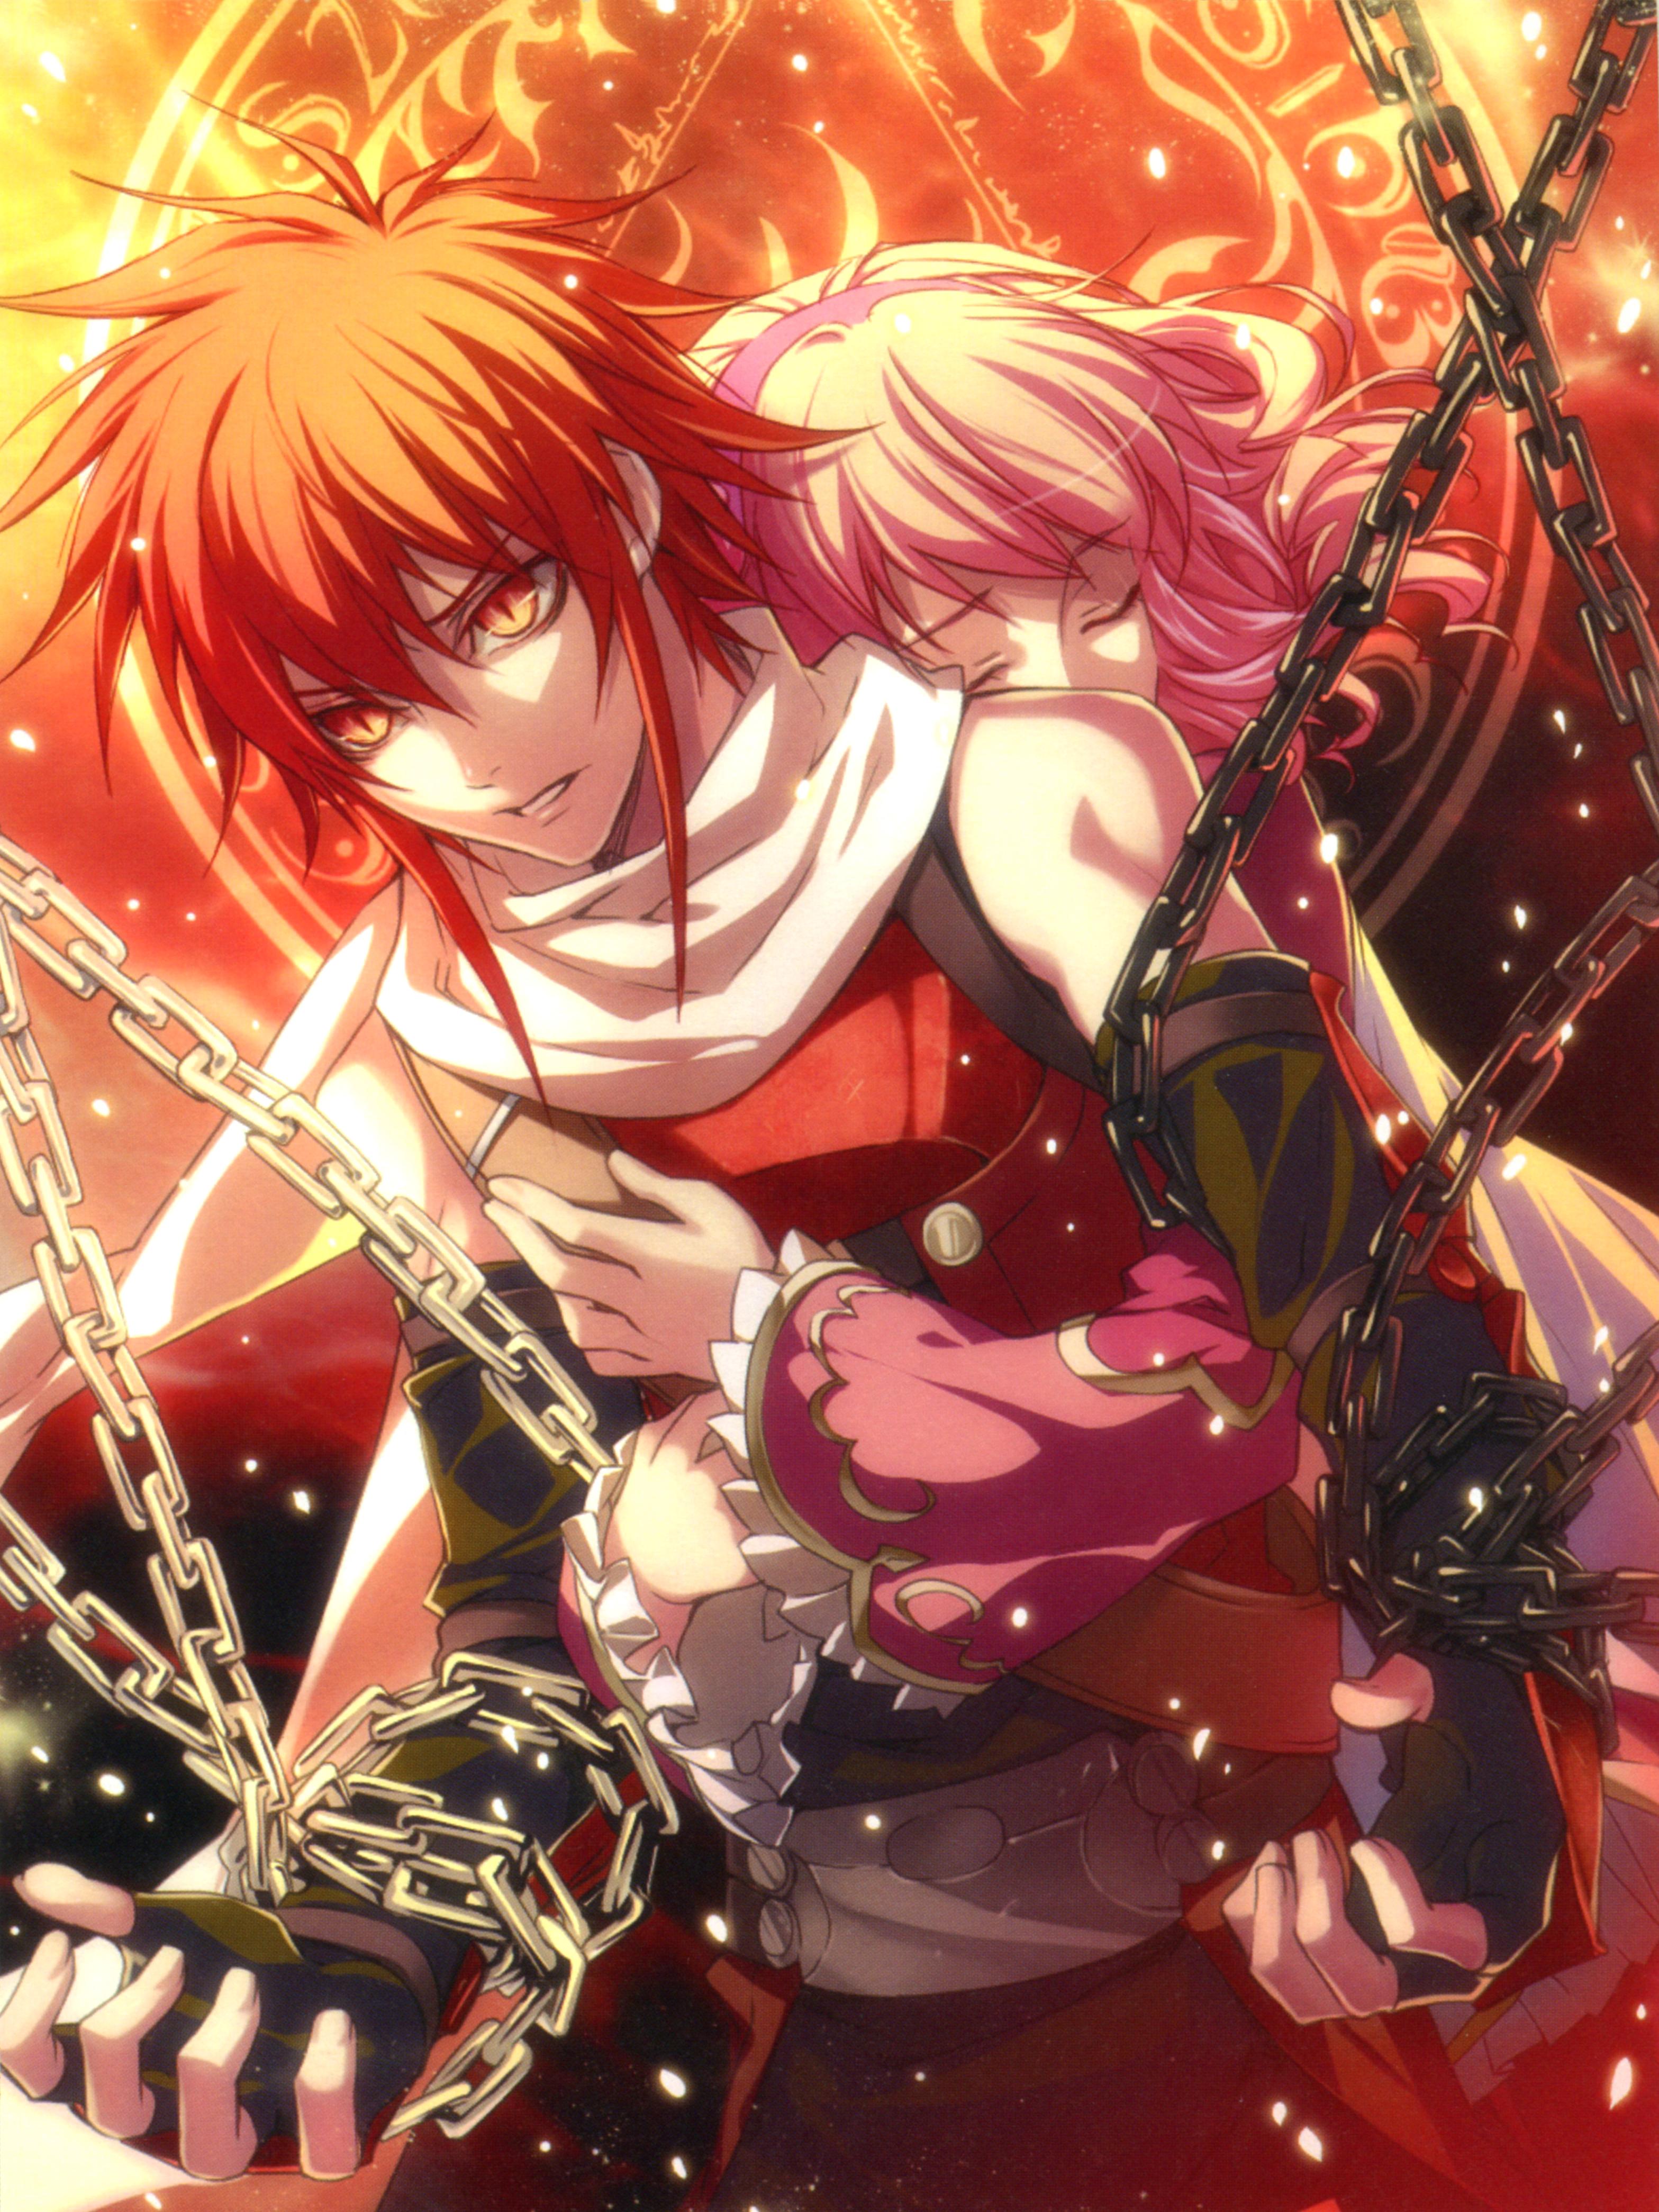 Wand of Fortune - Zerochan Anime Image Board